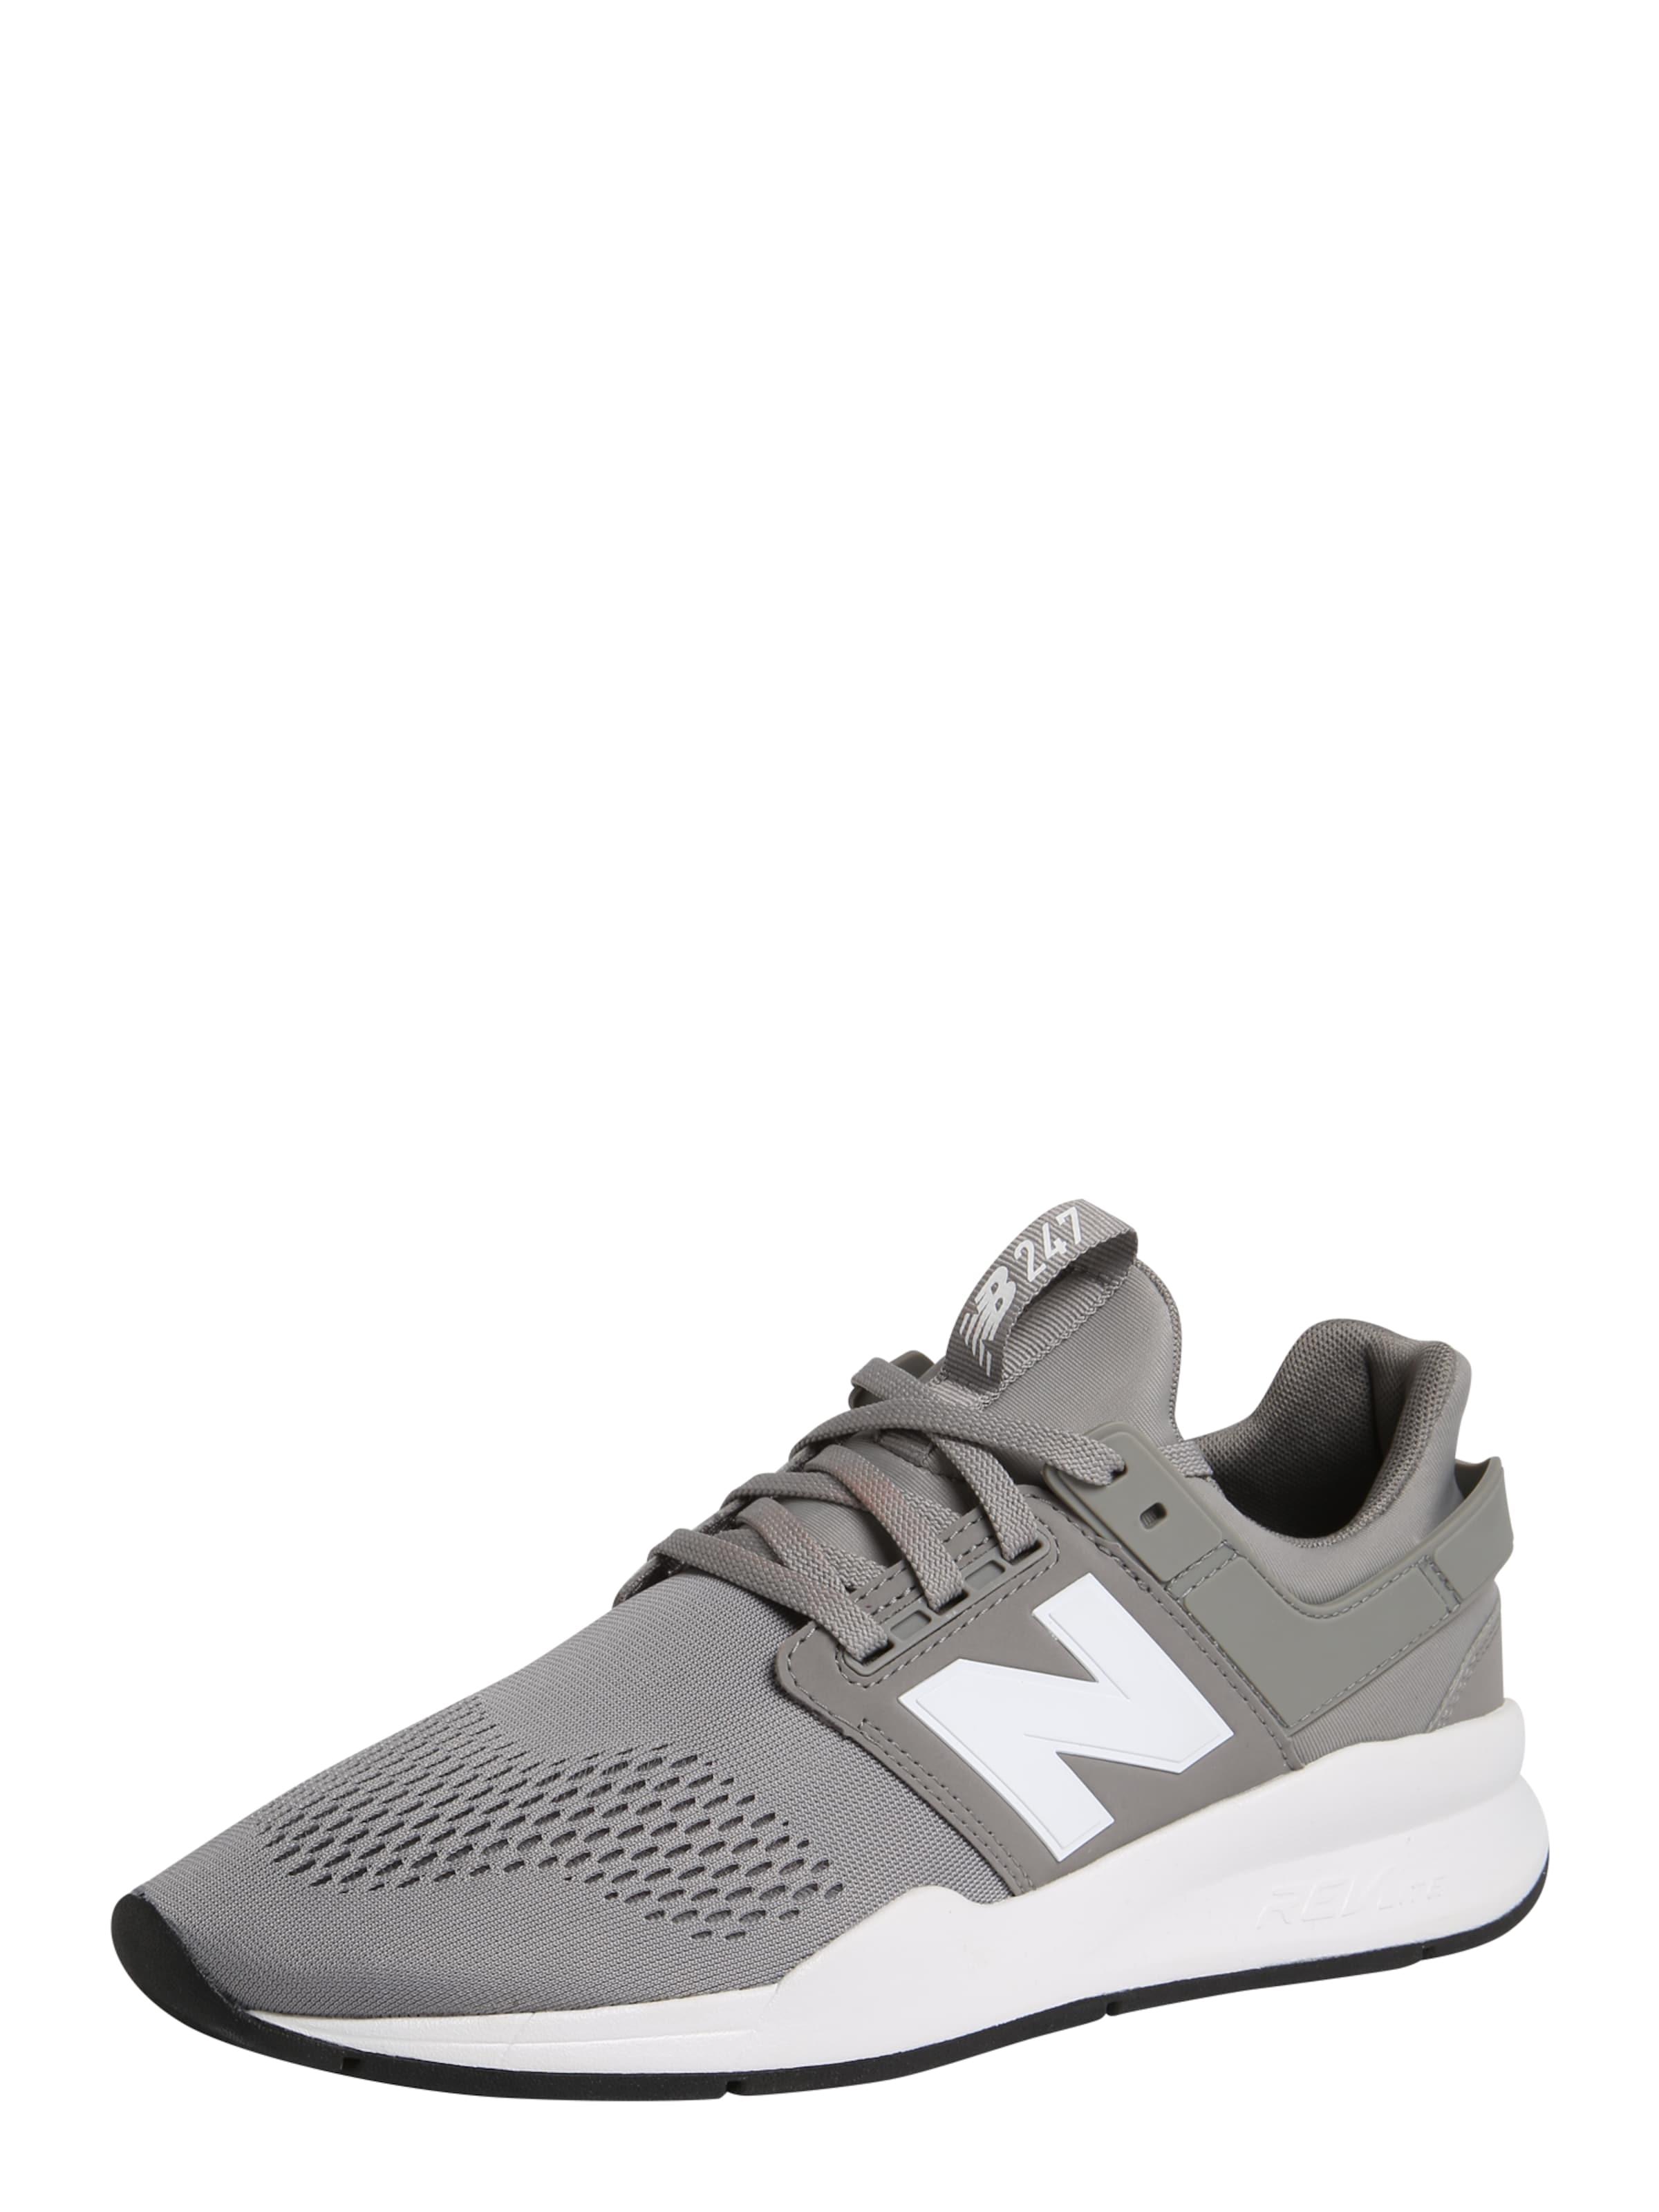 new balance Sneaker Low MS247 Hohe Qualität